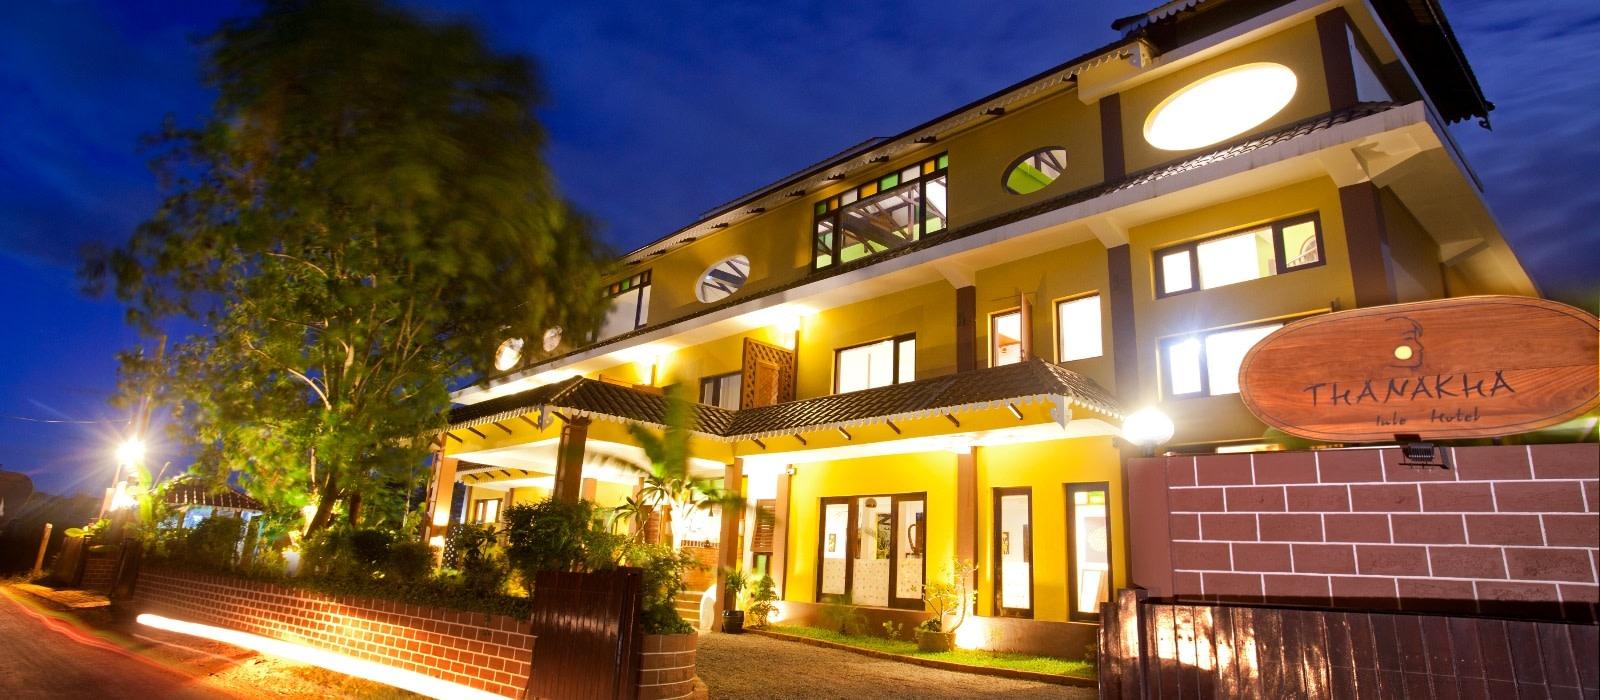 Hotel The Thanakha Myanmar